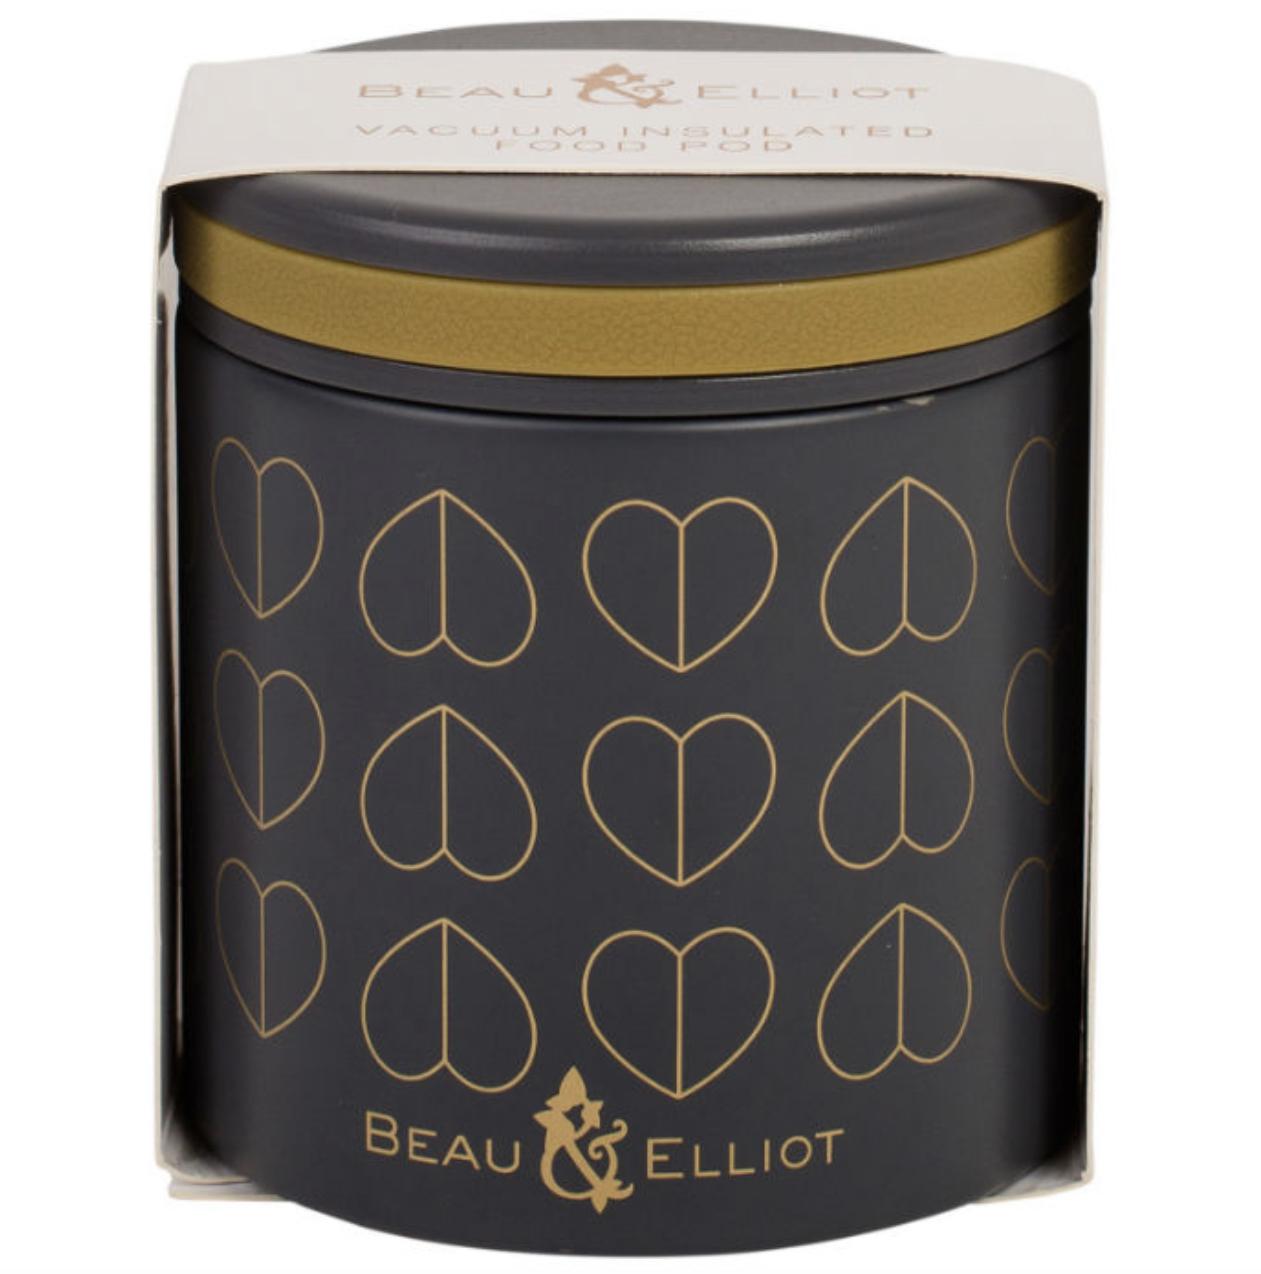 DOVE FOOD FLASK 400ML GREY HEART DESIGN BY BEAU & ELLIOT